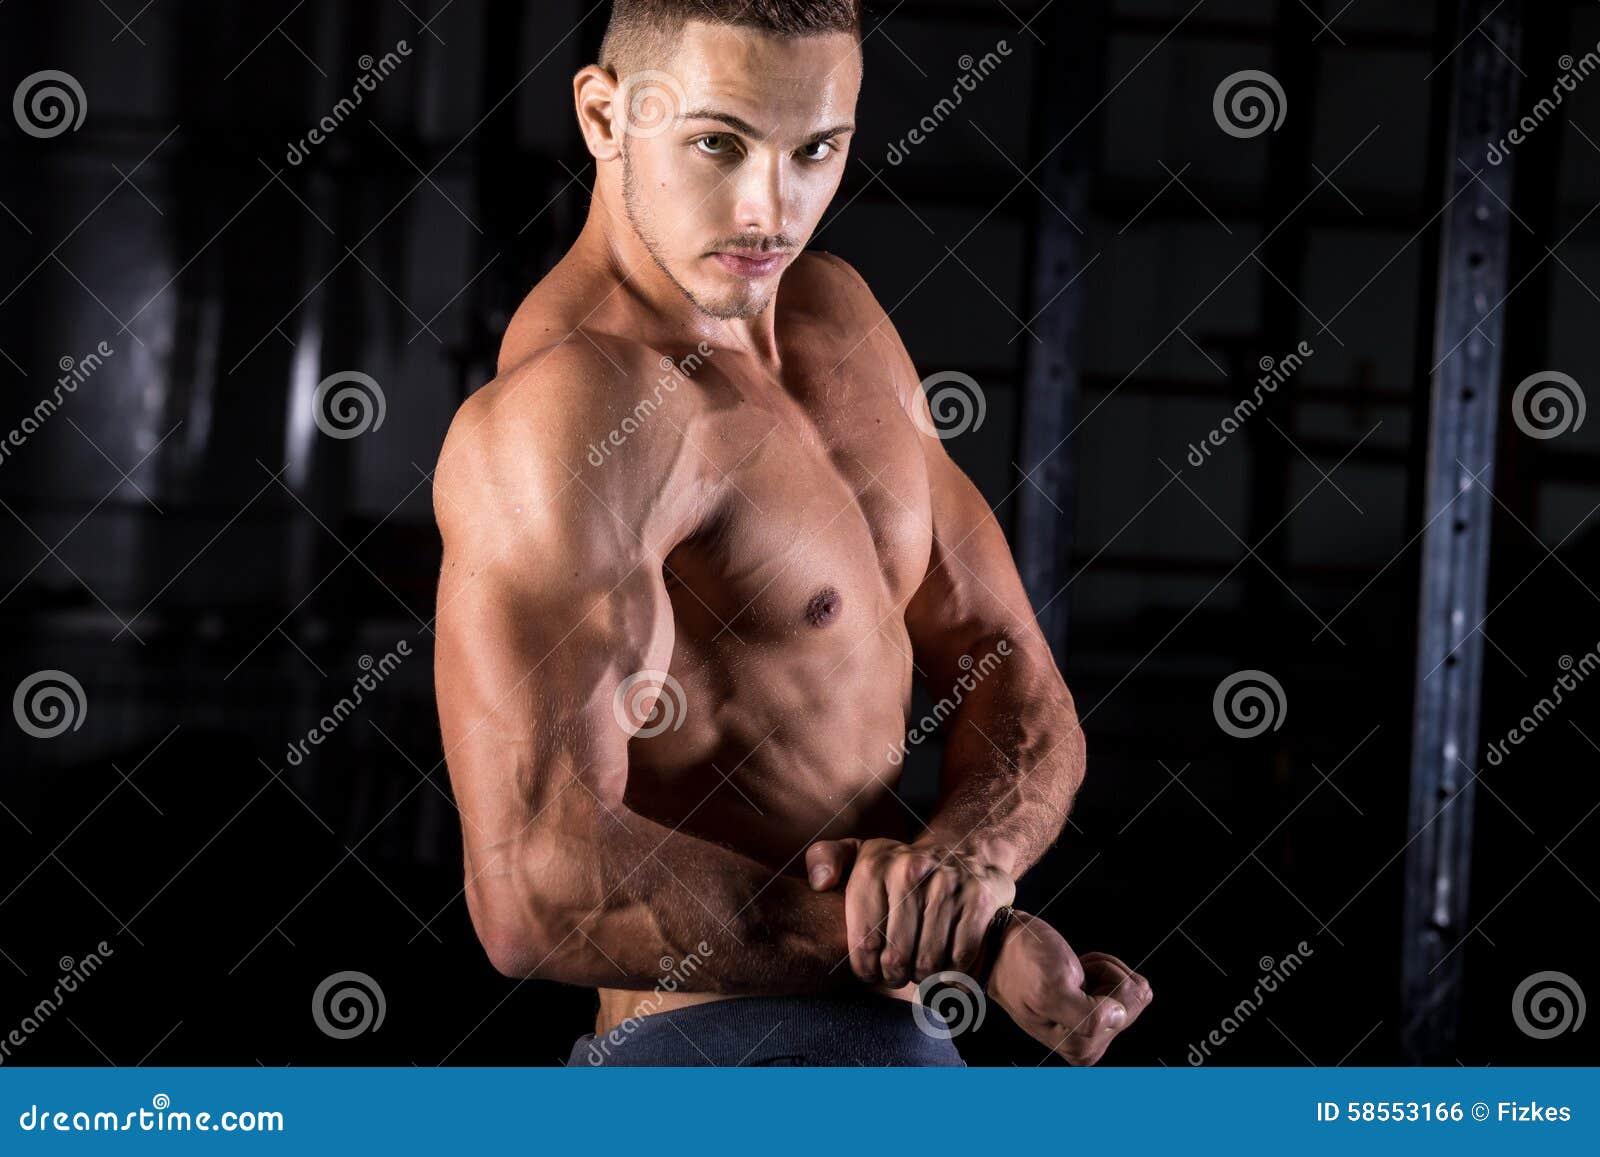 Jeune bodybuilder montrant le biceps fort